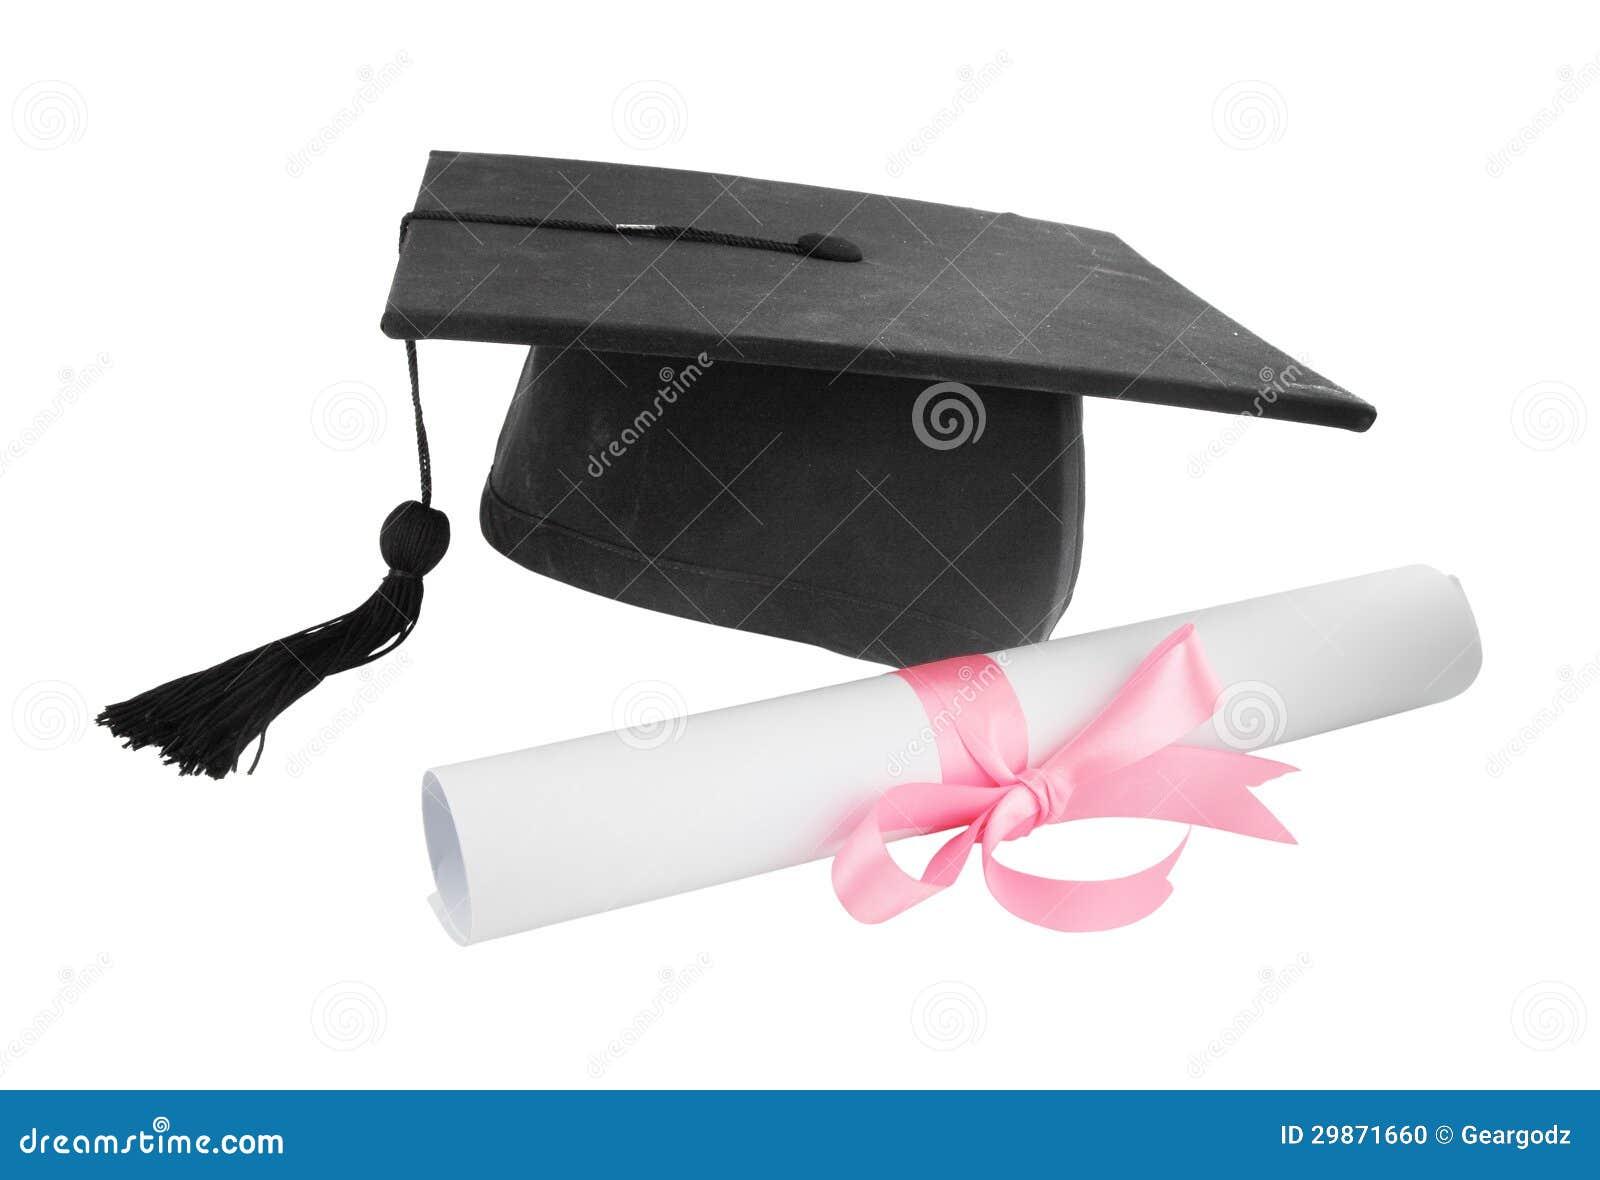 graduation cap and diploma on white background mr no pr no 2 172 1